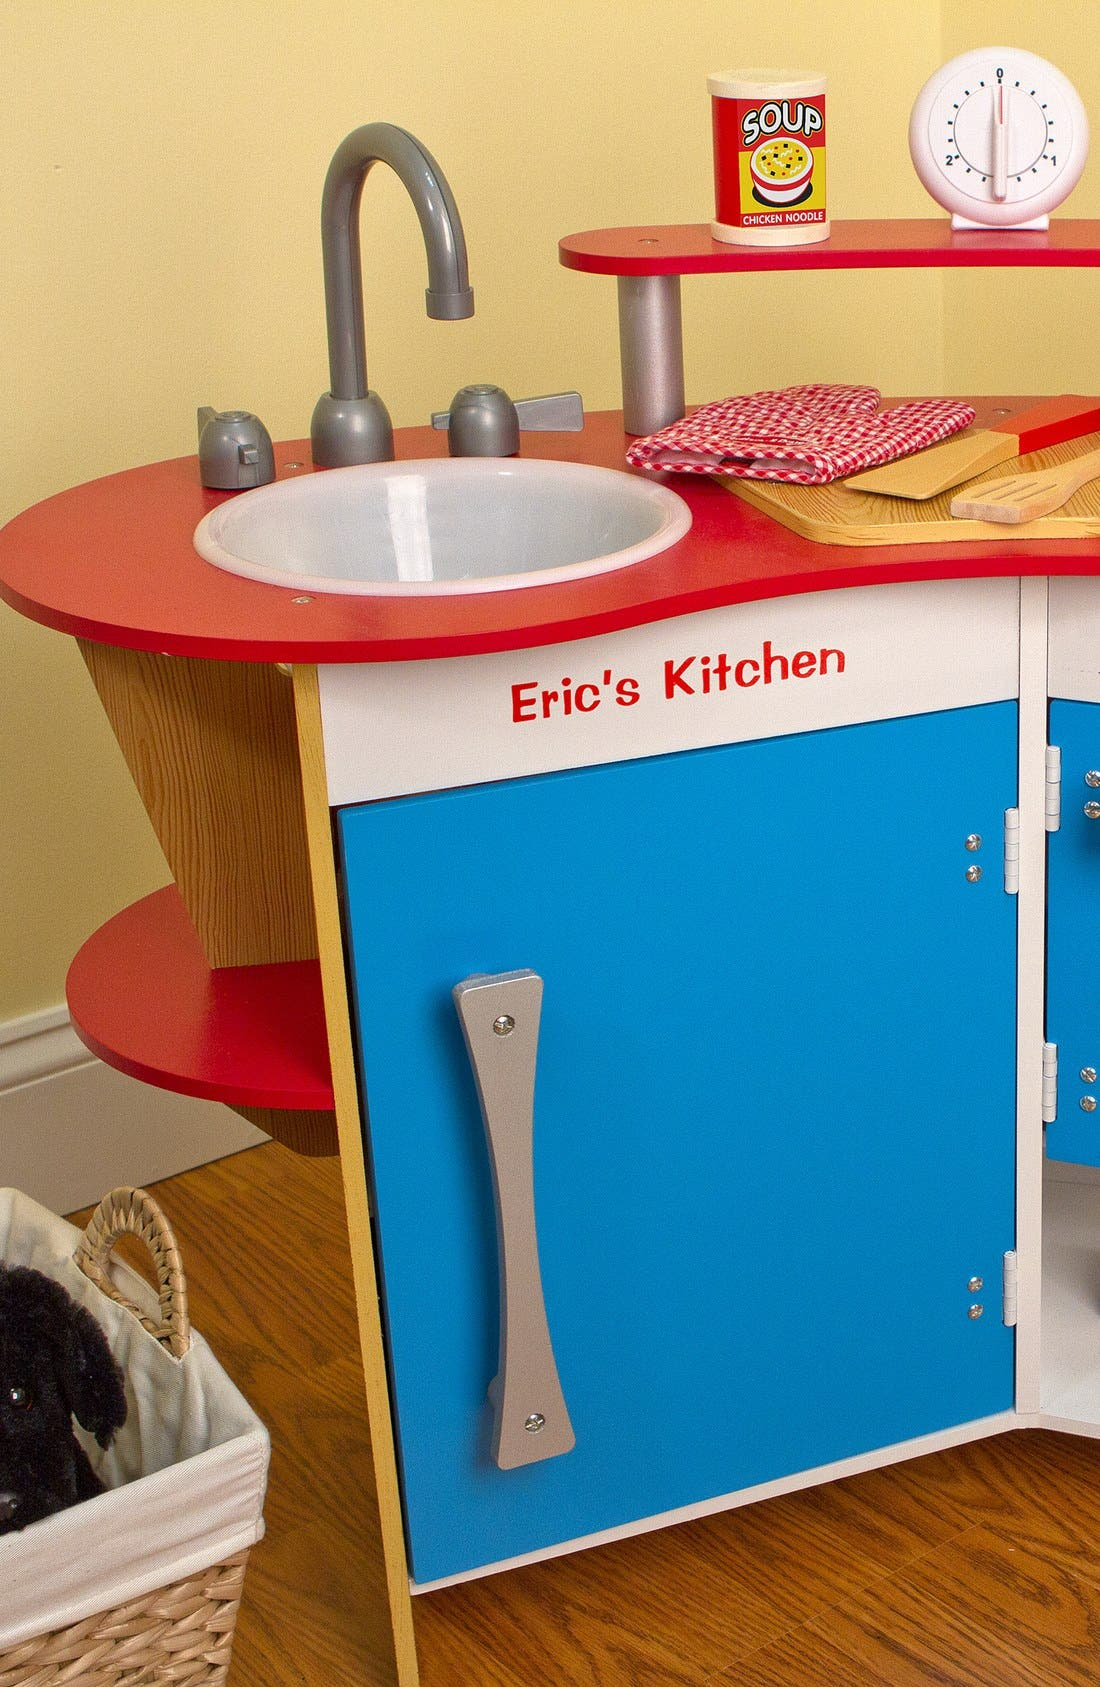 'Cook's Corner' Personalized Kitchen,                         Main,                         color, 600